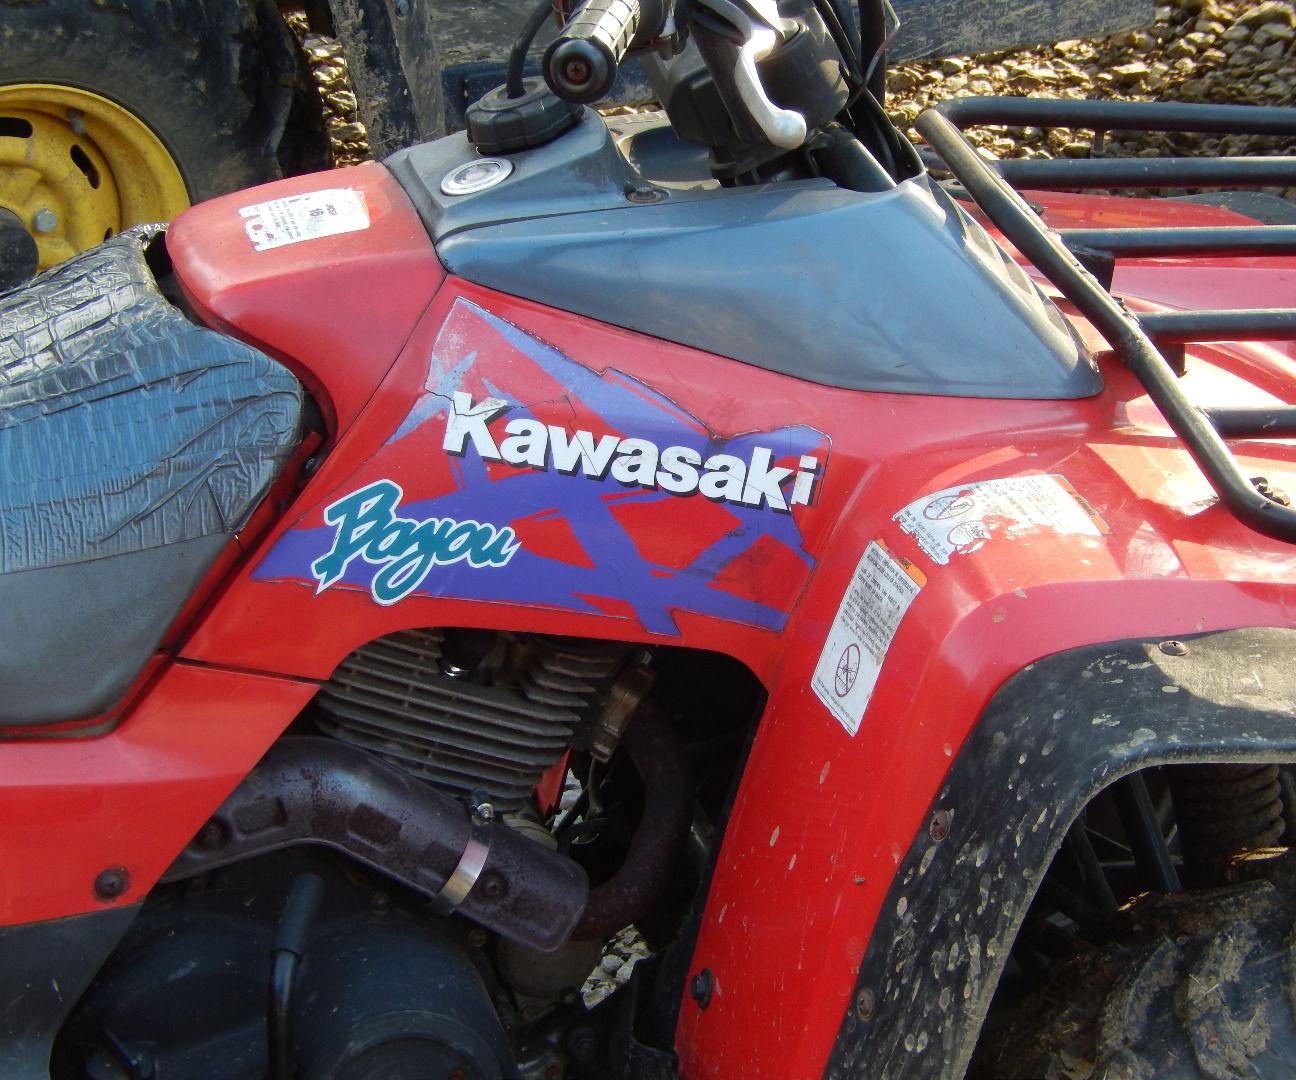 medium resolution of troubleshooting repairing a kawasaki bayou klf300 atv electrical charging system